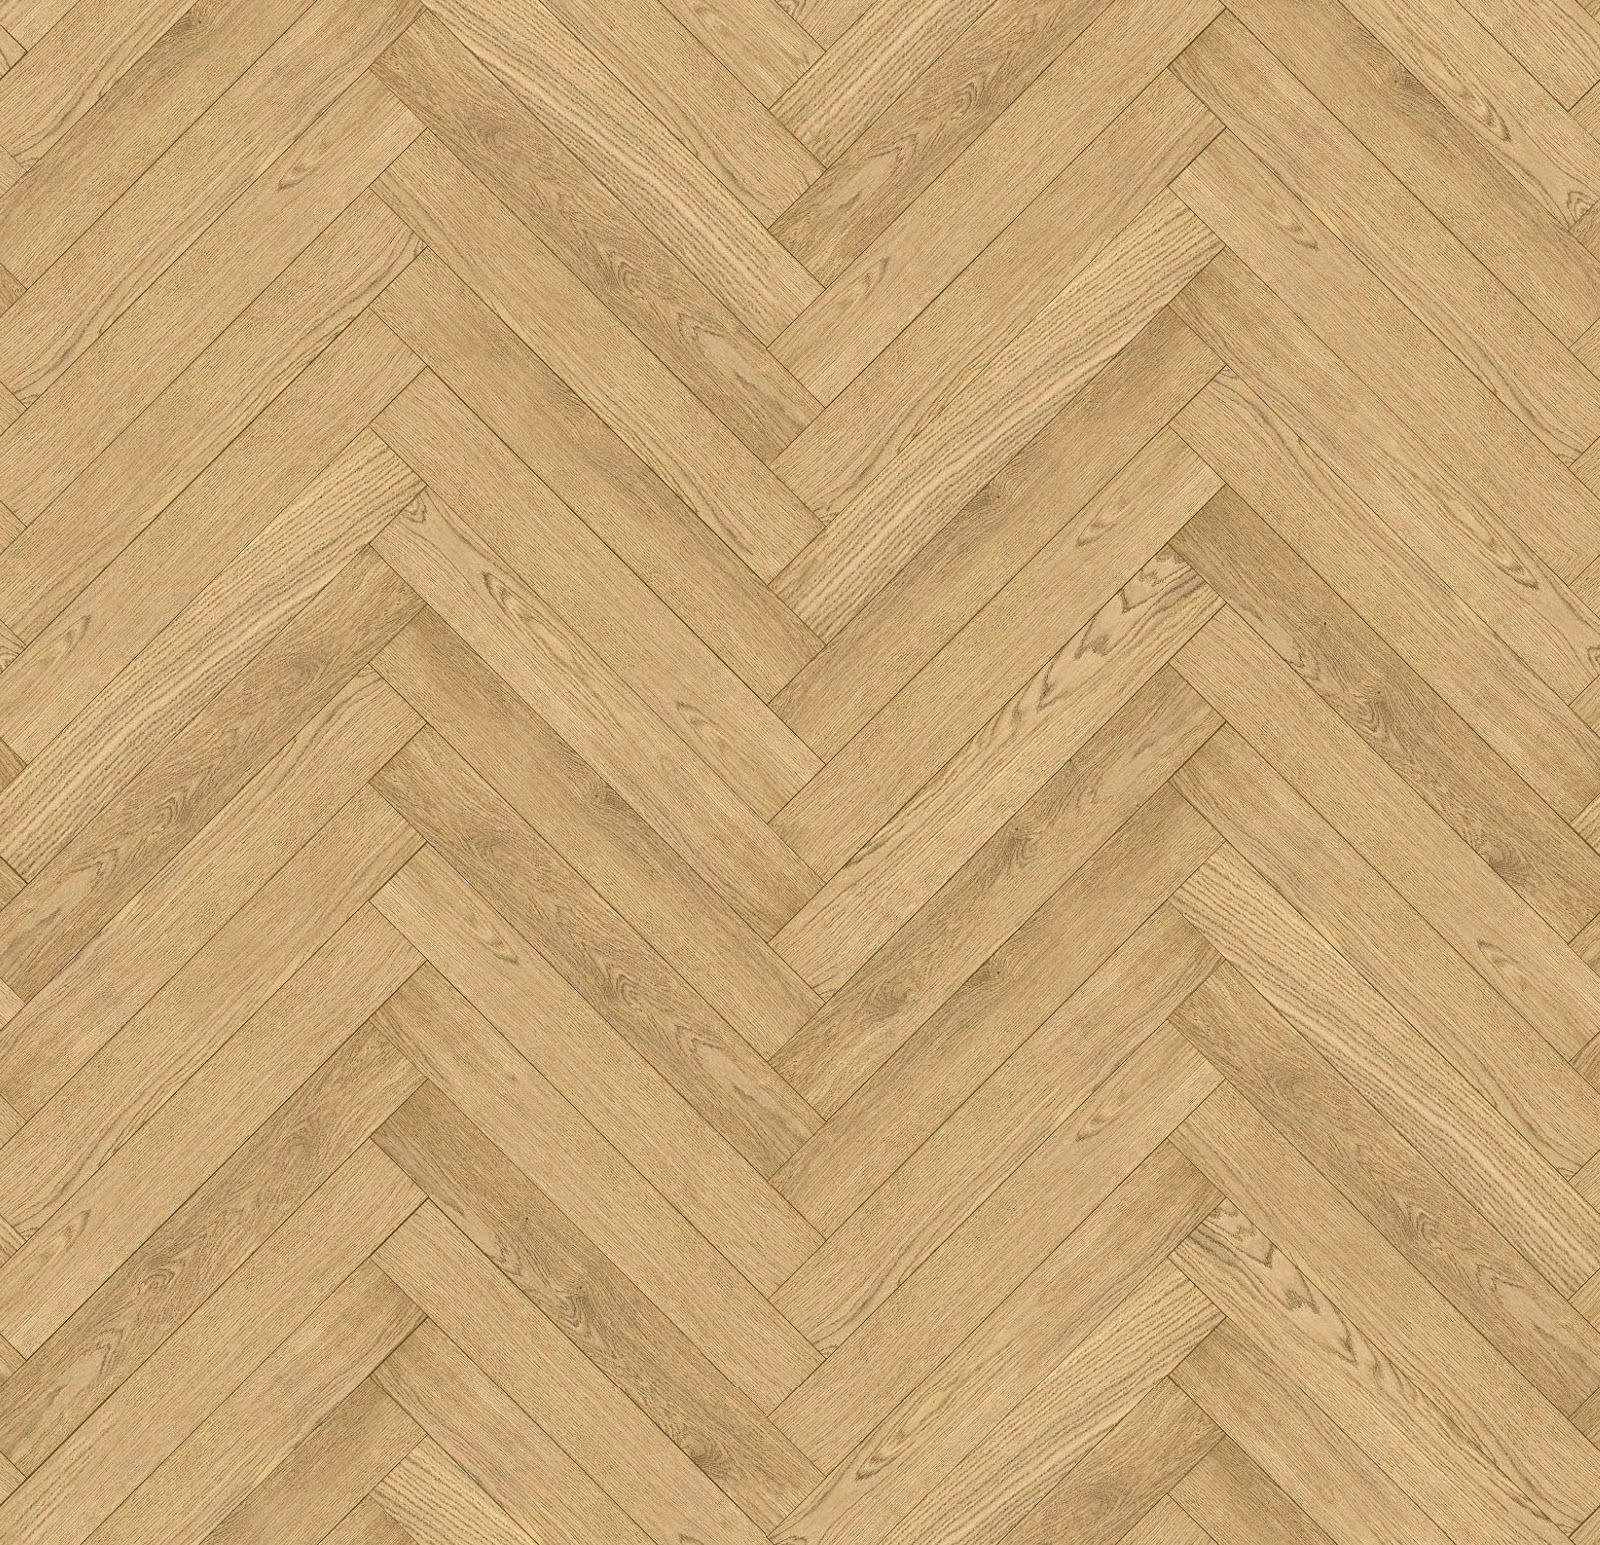 Seamless Wood Parquet Texture Maps